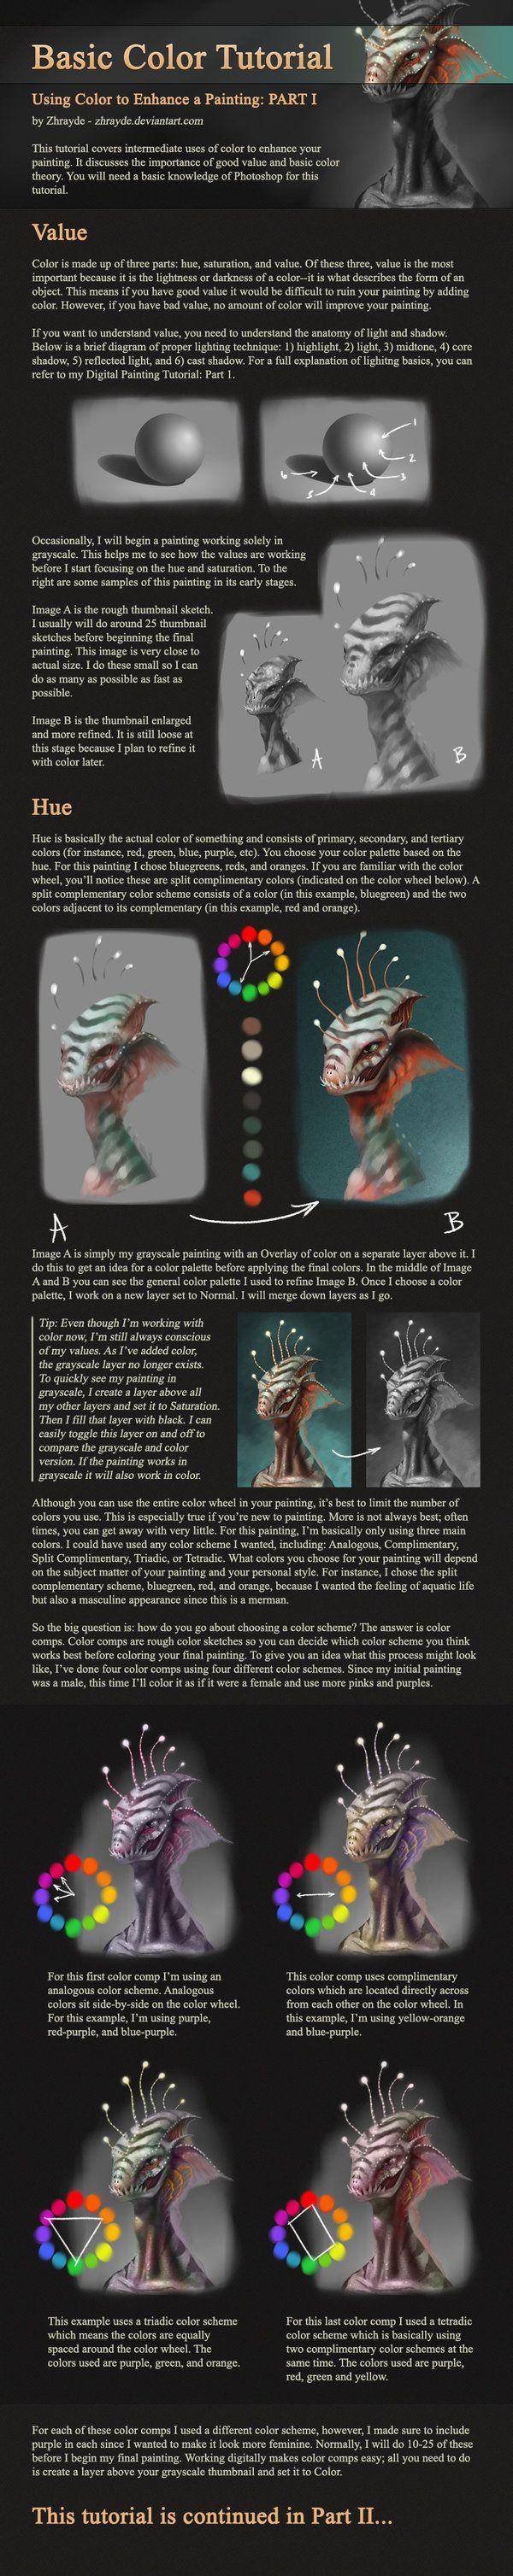 Basic Color Tutorial - Part 1 by Zhrayde on DeviantArt